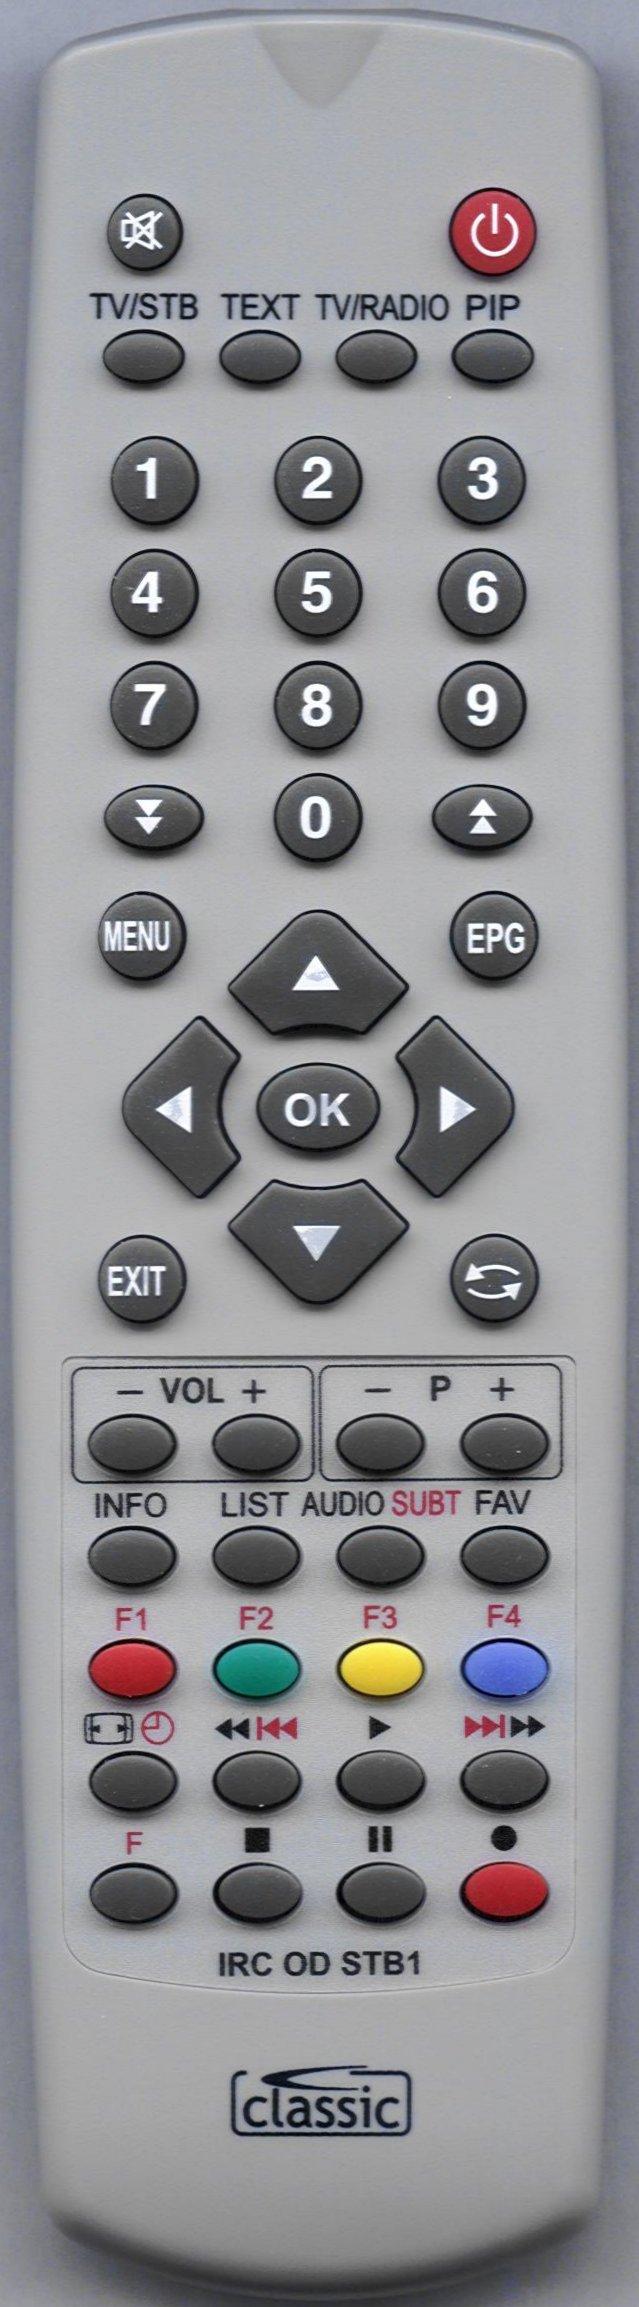 TECHNOMATE TM-5200D M2 USB SUPER PLUS Remote Control